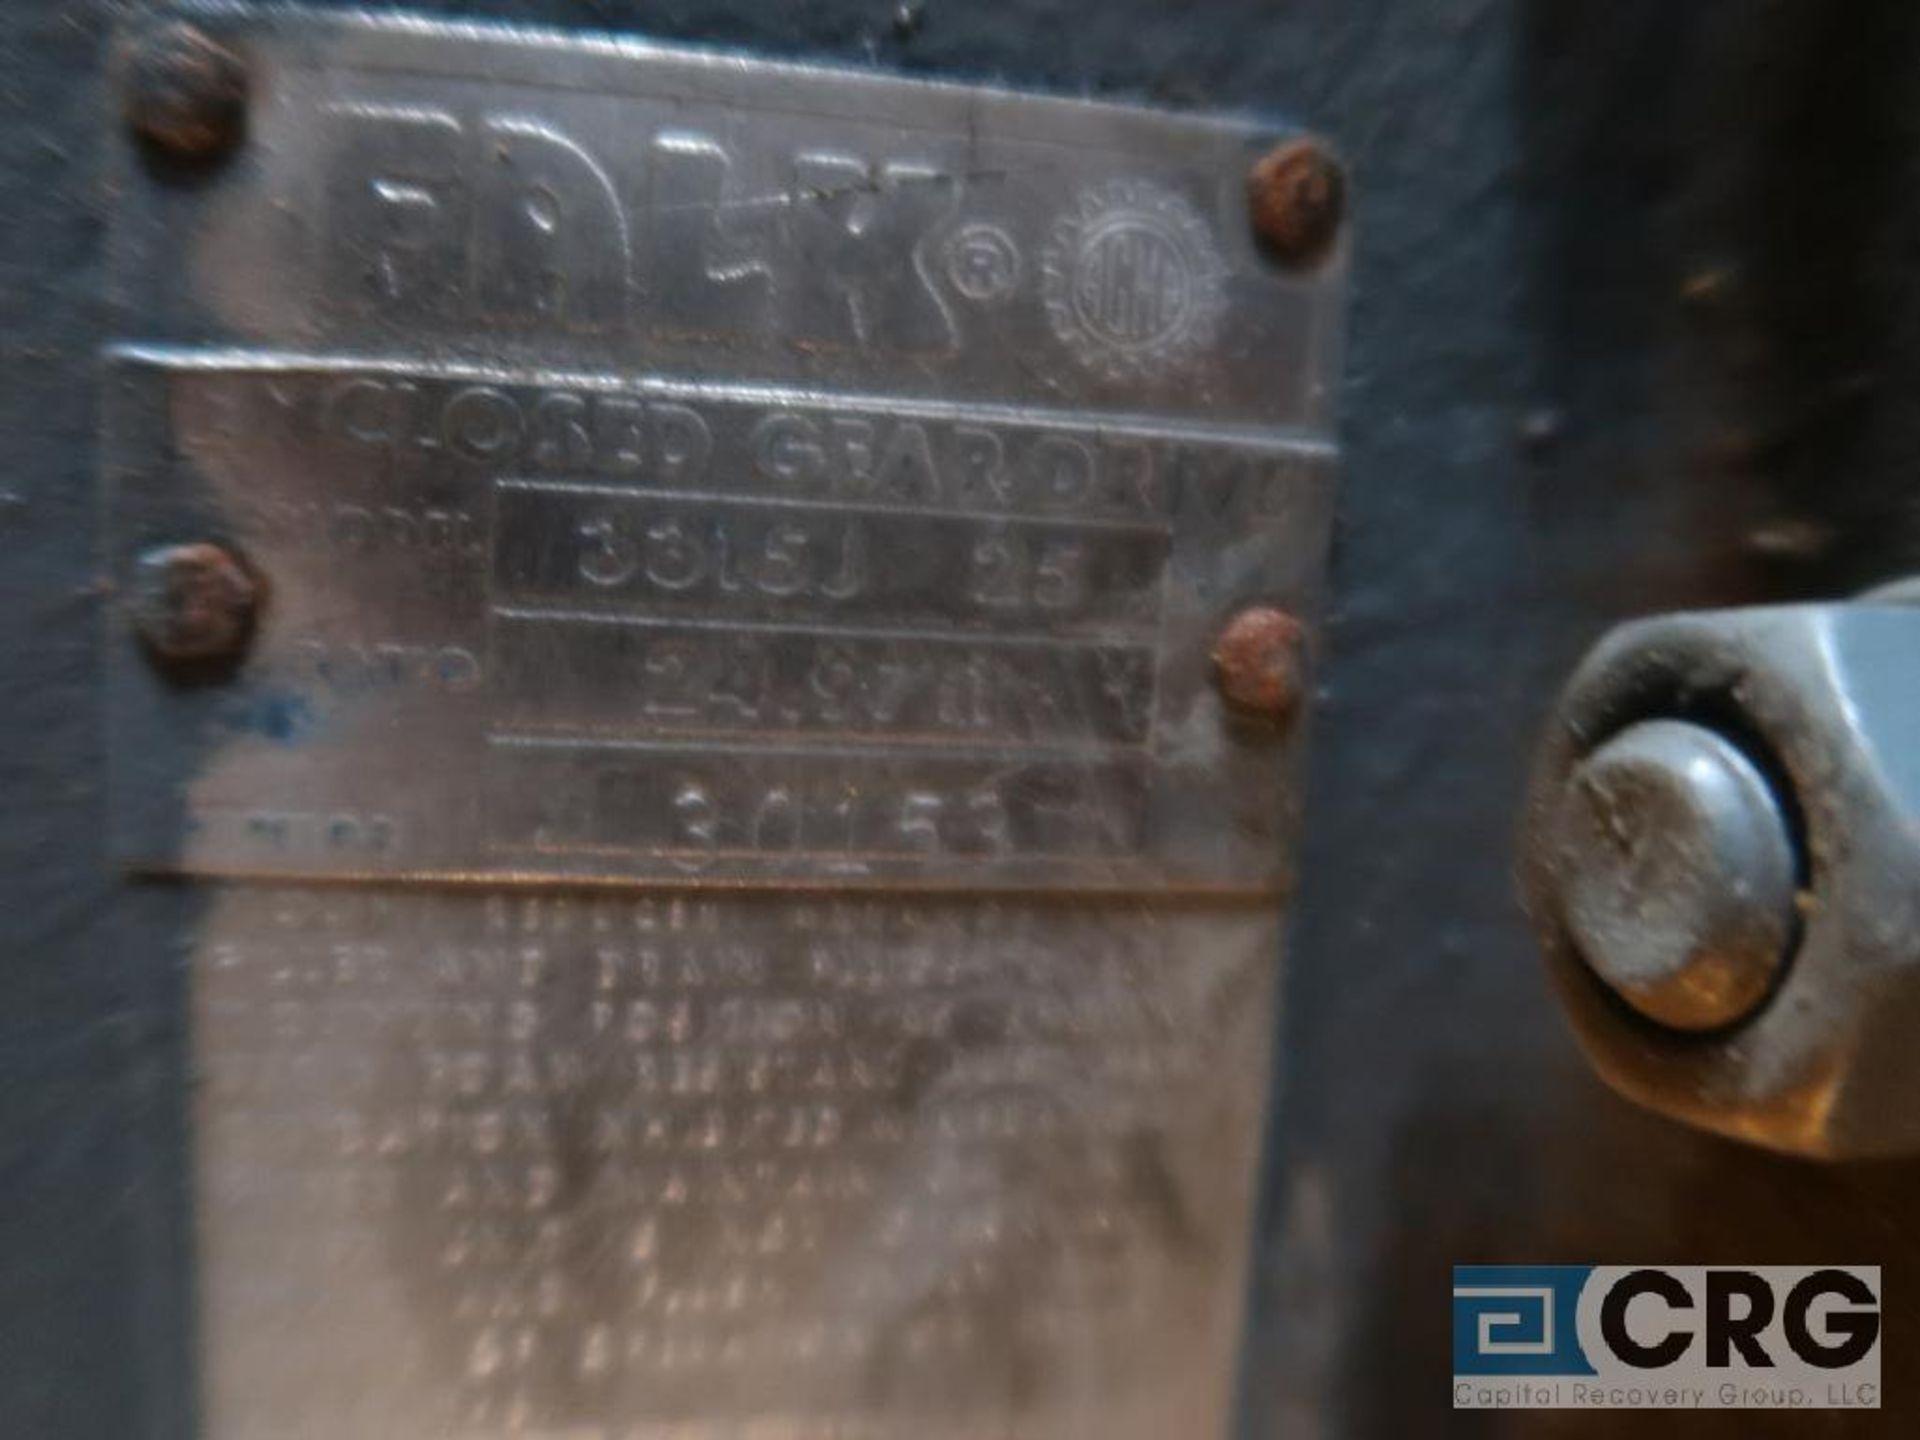 Falk 3315 J25 quadrive, ratio-24.97 (Next Bay Cage Area) - Image 2 of 2